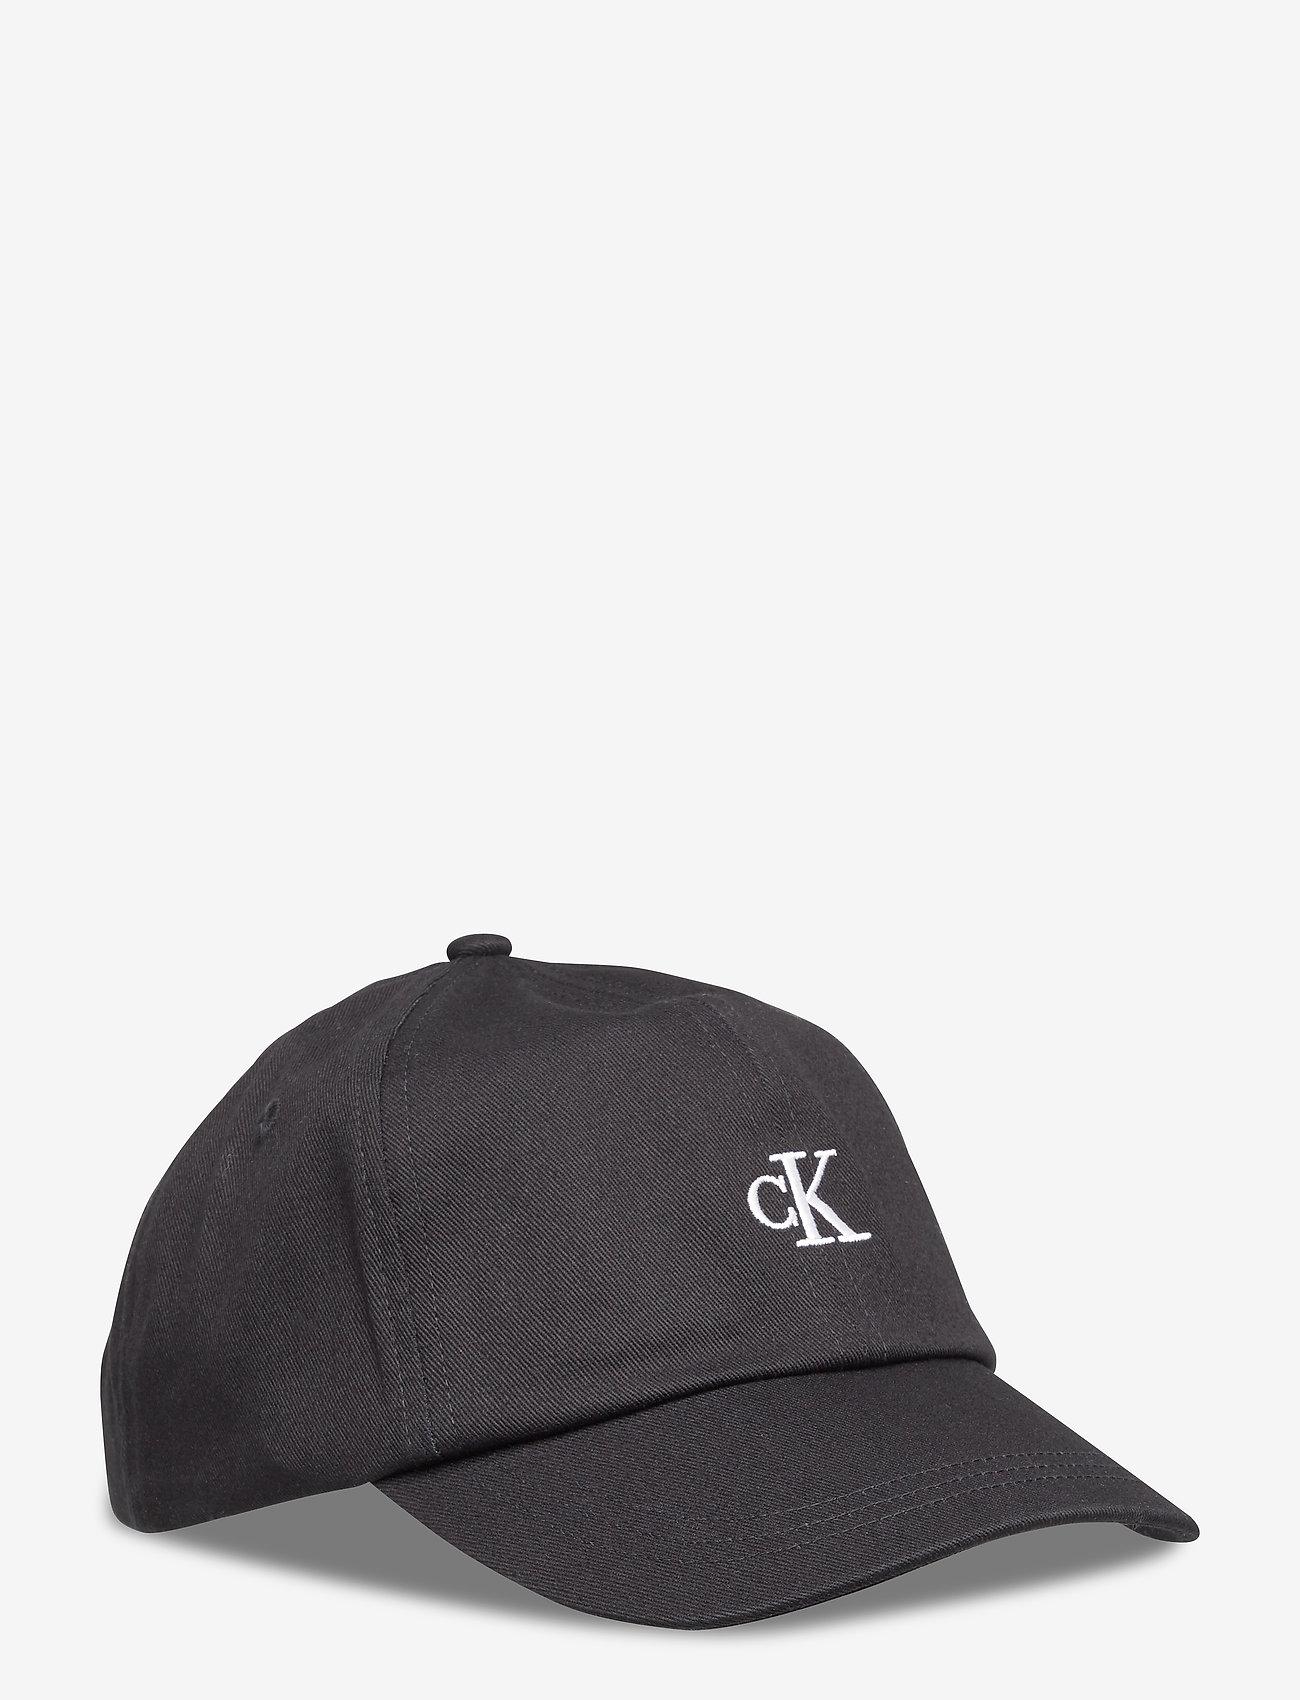 Calvin Klein - MONOGRAM BASEBALL CAP - czapki - ck black - 0